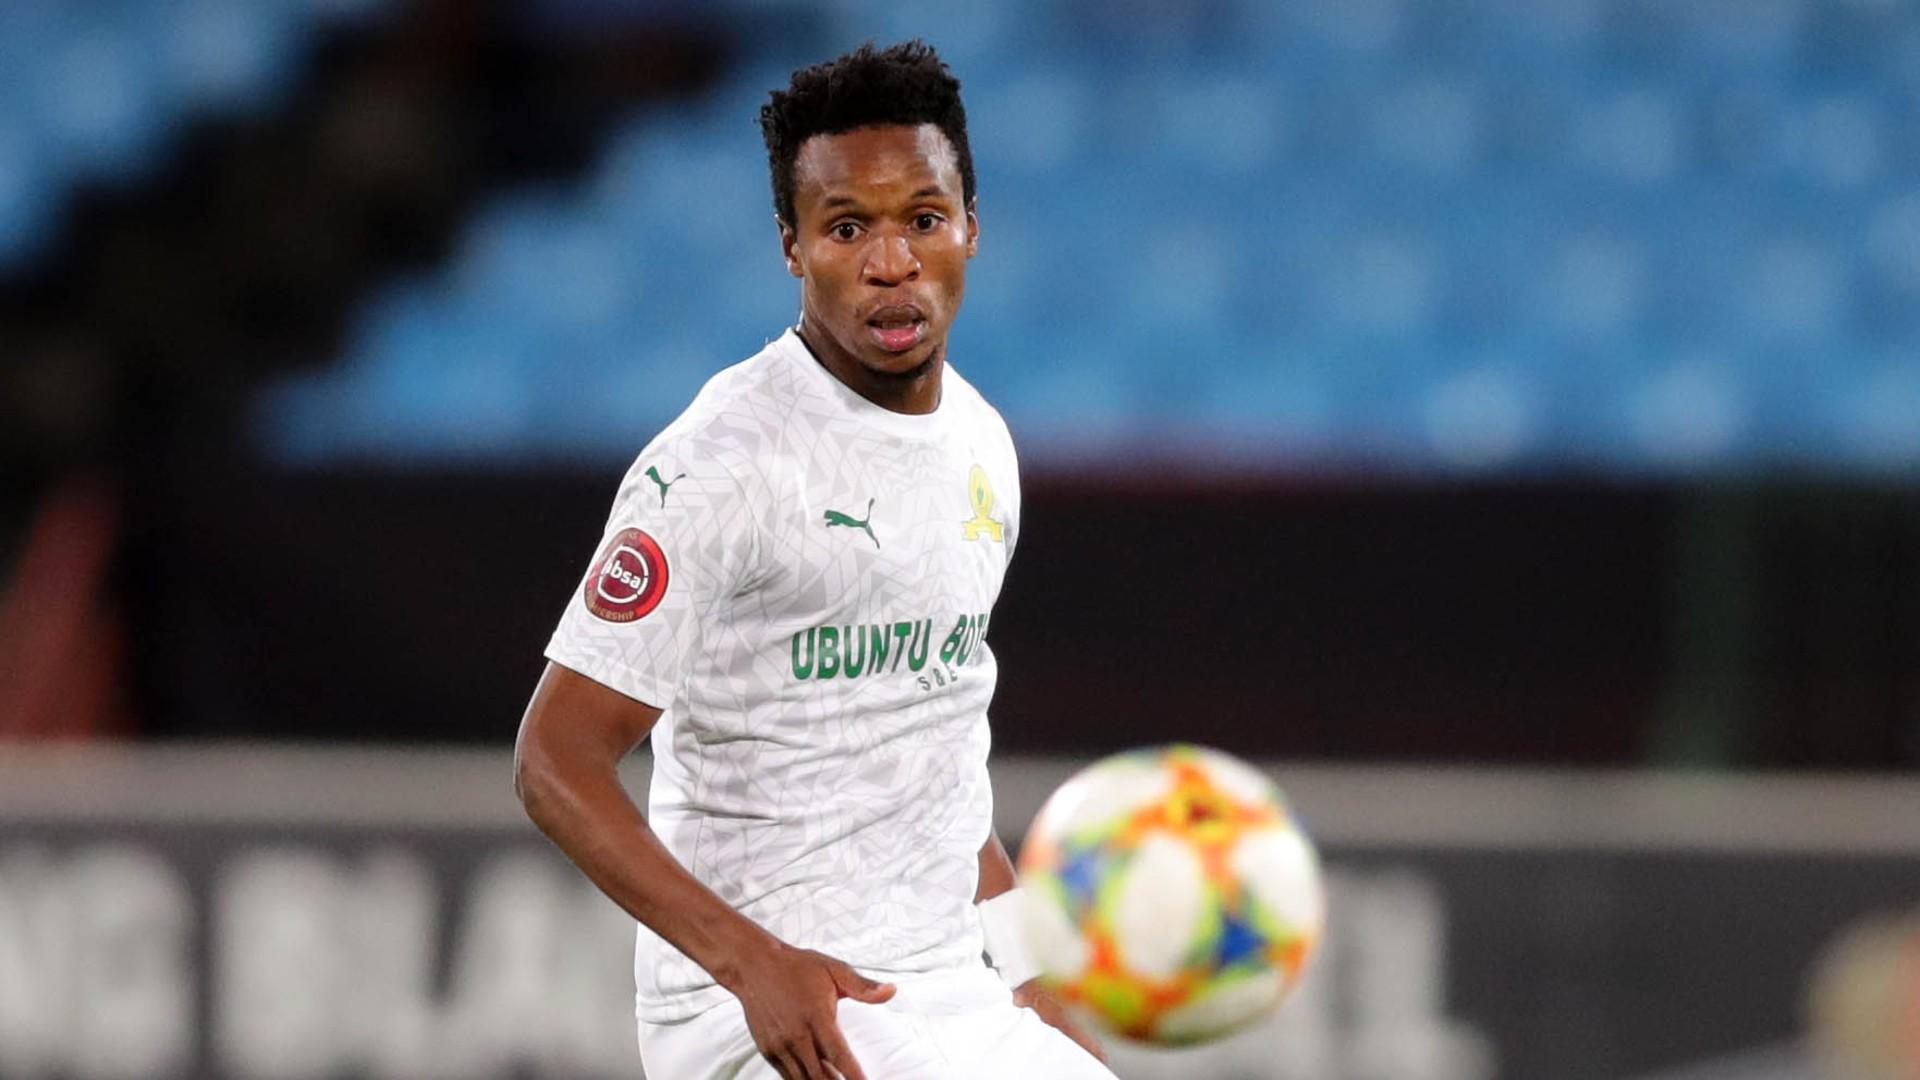 Mamelodi Sundowns' Zwane will vote for Kaizer Chiefs star Manyama for Player's Player of the Year